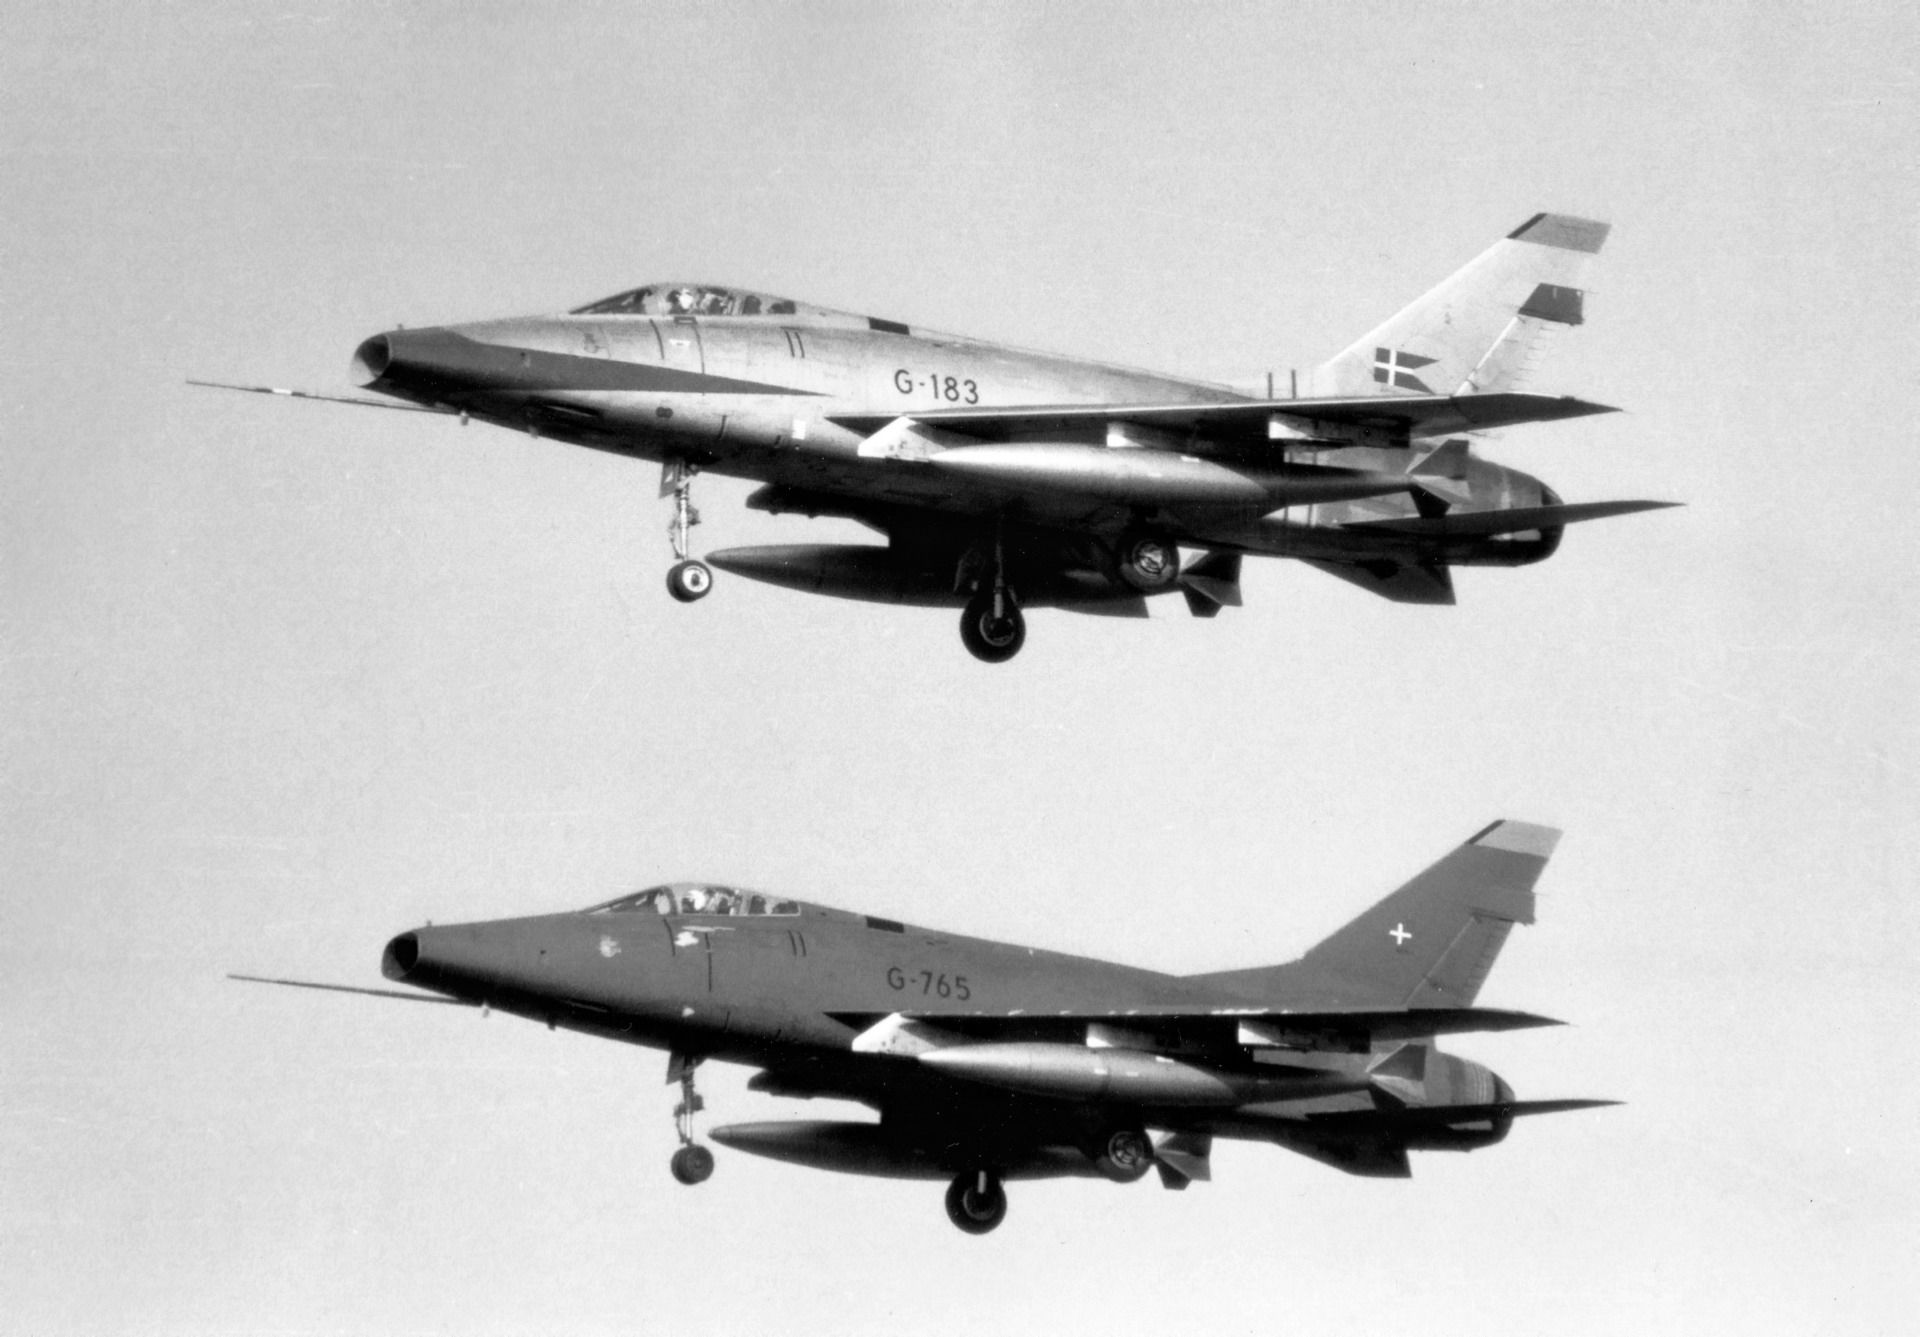 North American F-100D Super Sabres - Flyvevåbnet (Royal Dutch Air Force), Denmark